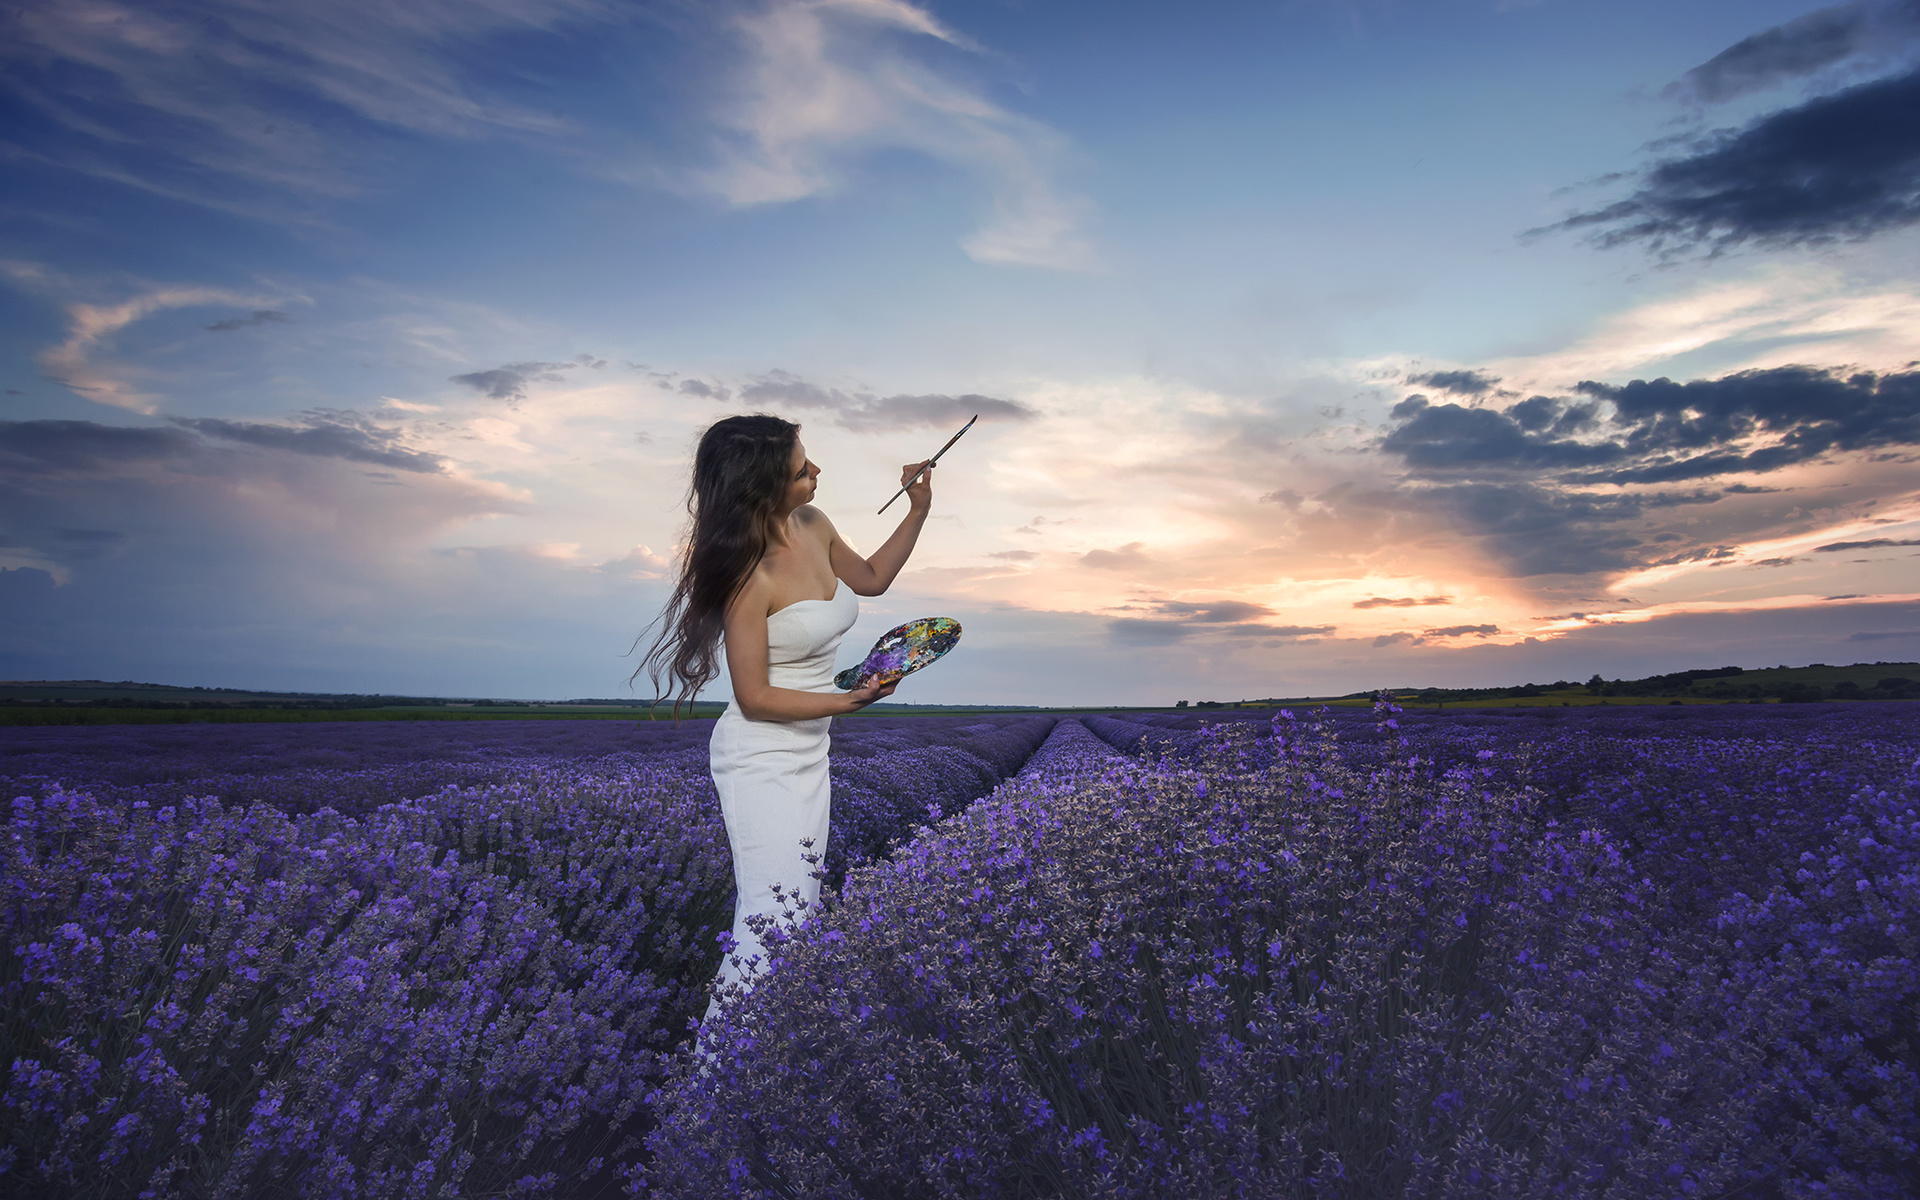 поле, небо, девушка, природа, краски, платье, шатенка, кисть, художница, лаванда